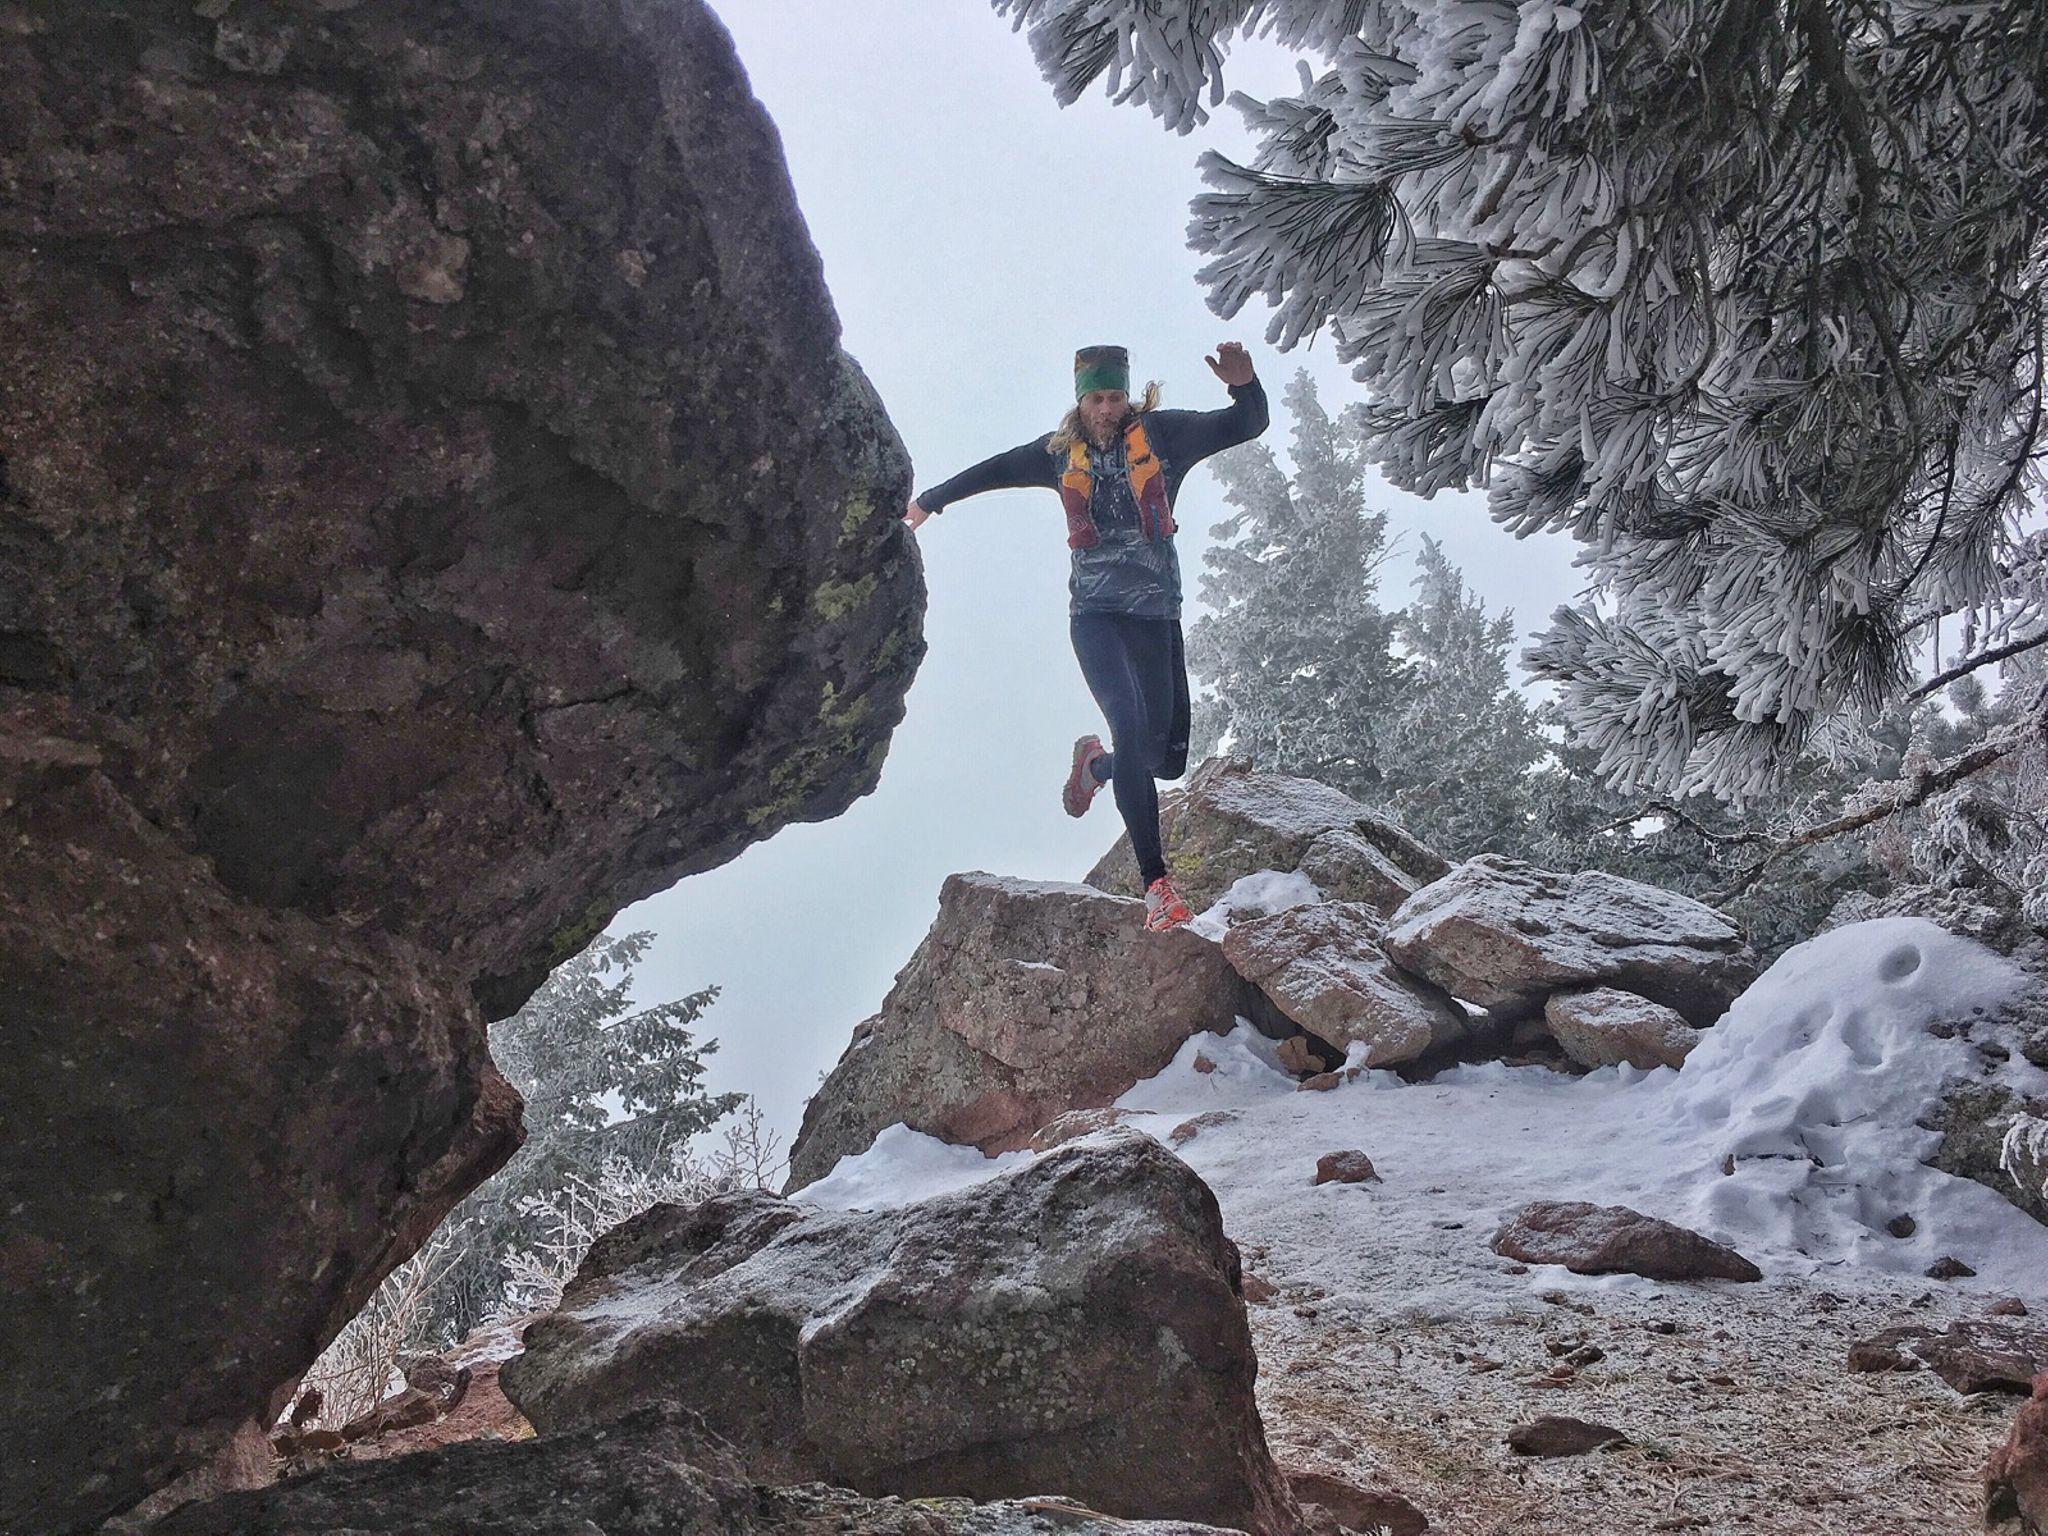 Tim Olsen sets new FKT on Pacific Crest Trail - Canadian Running Magazine